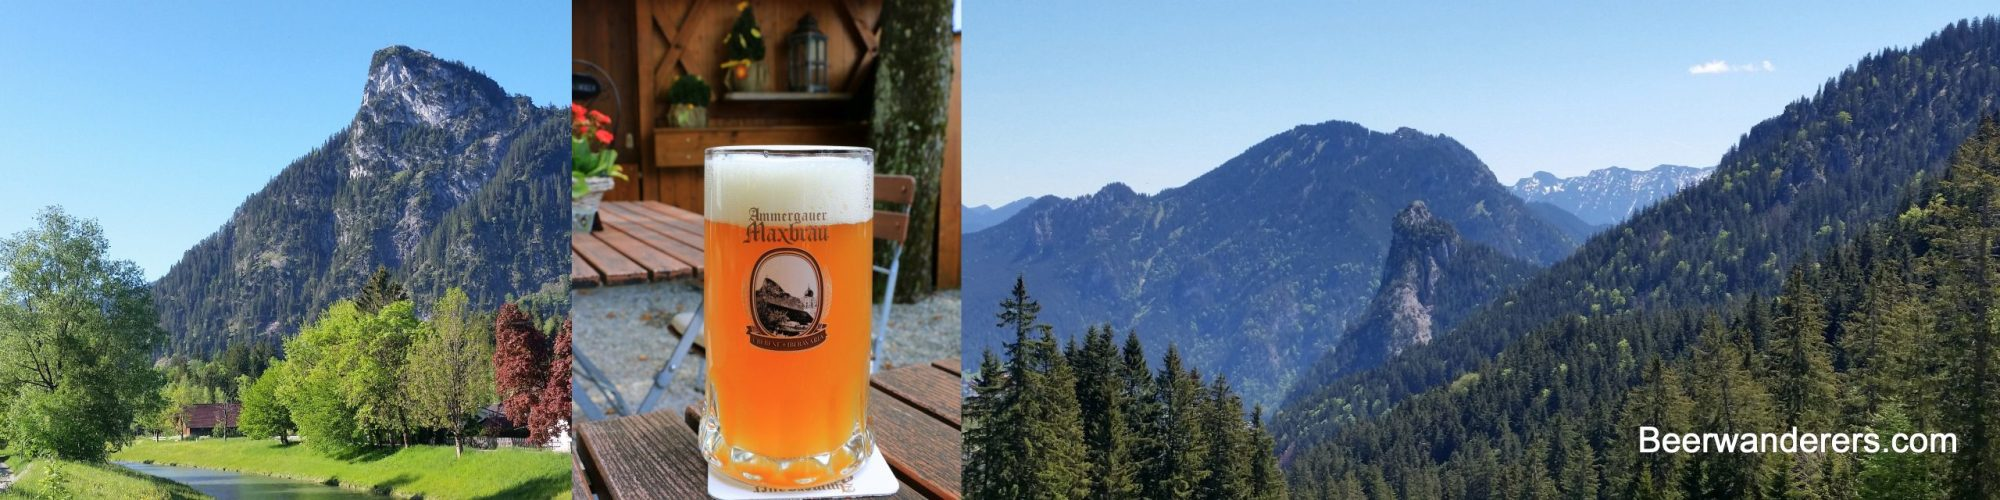 mountain peak beer mountains